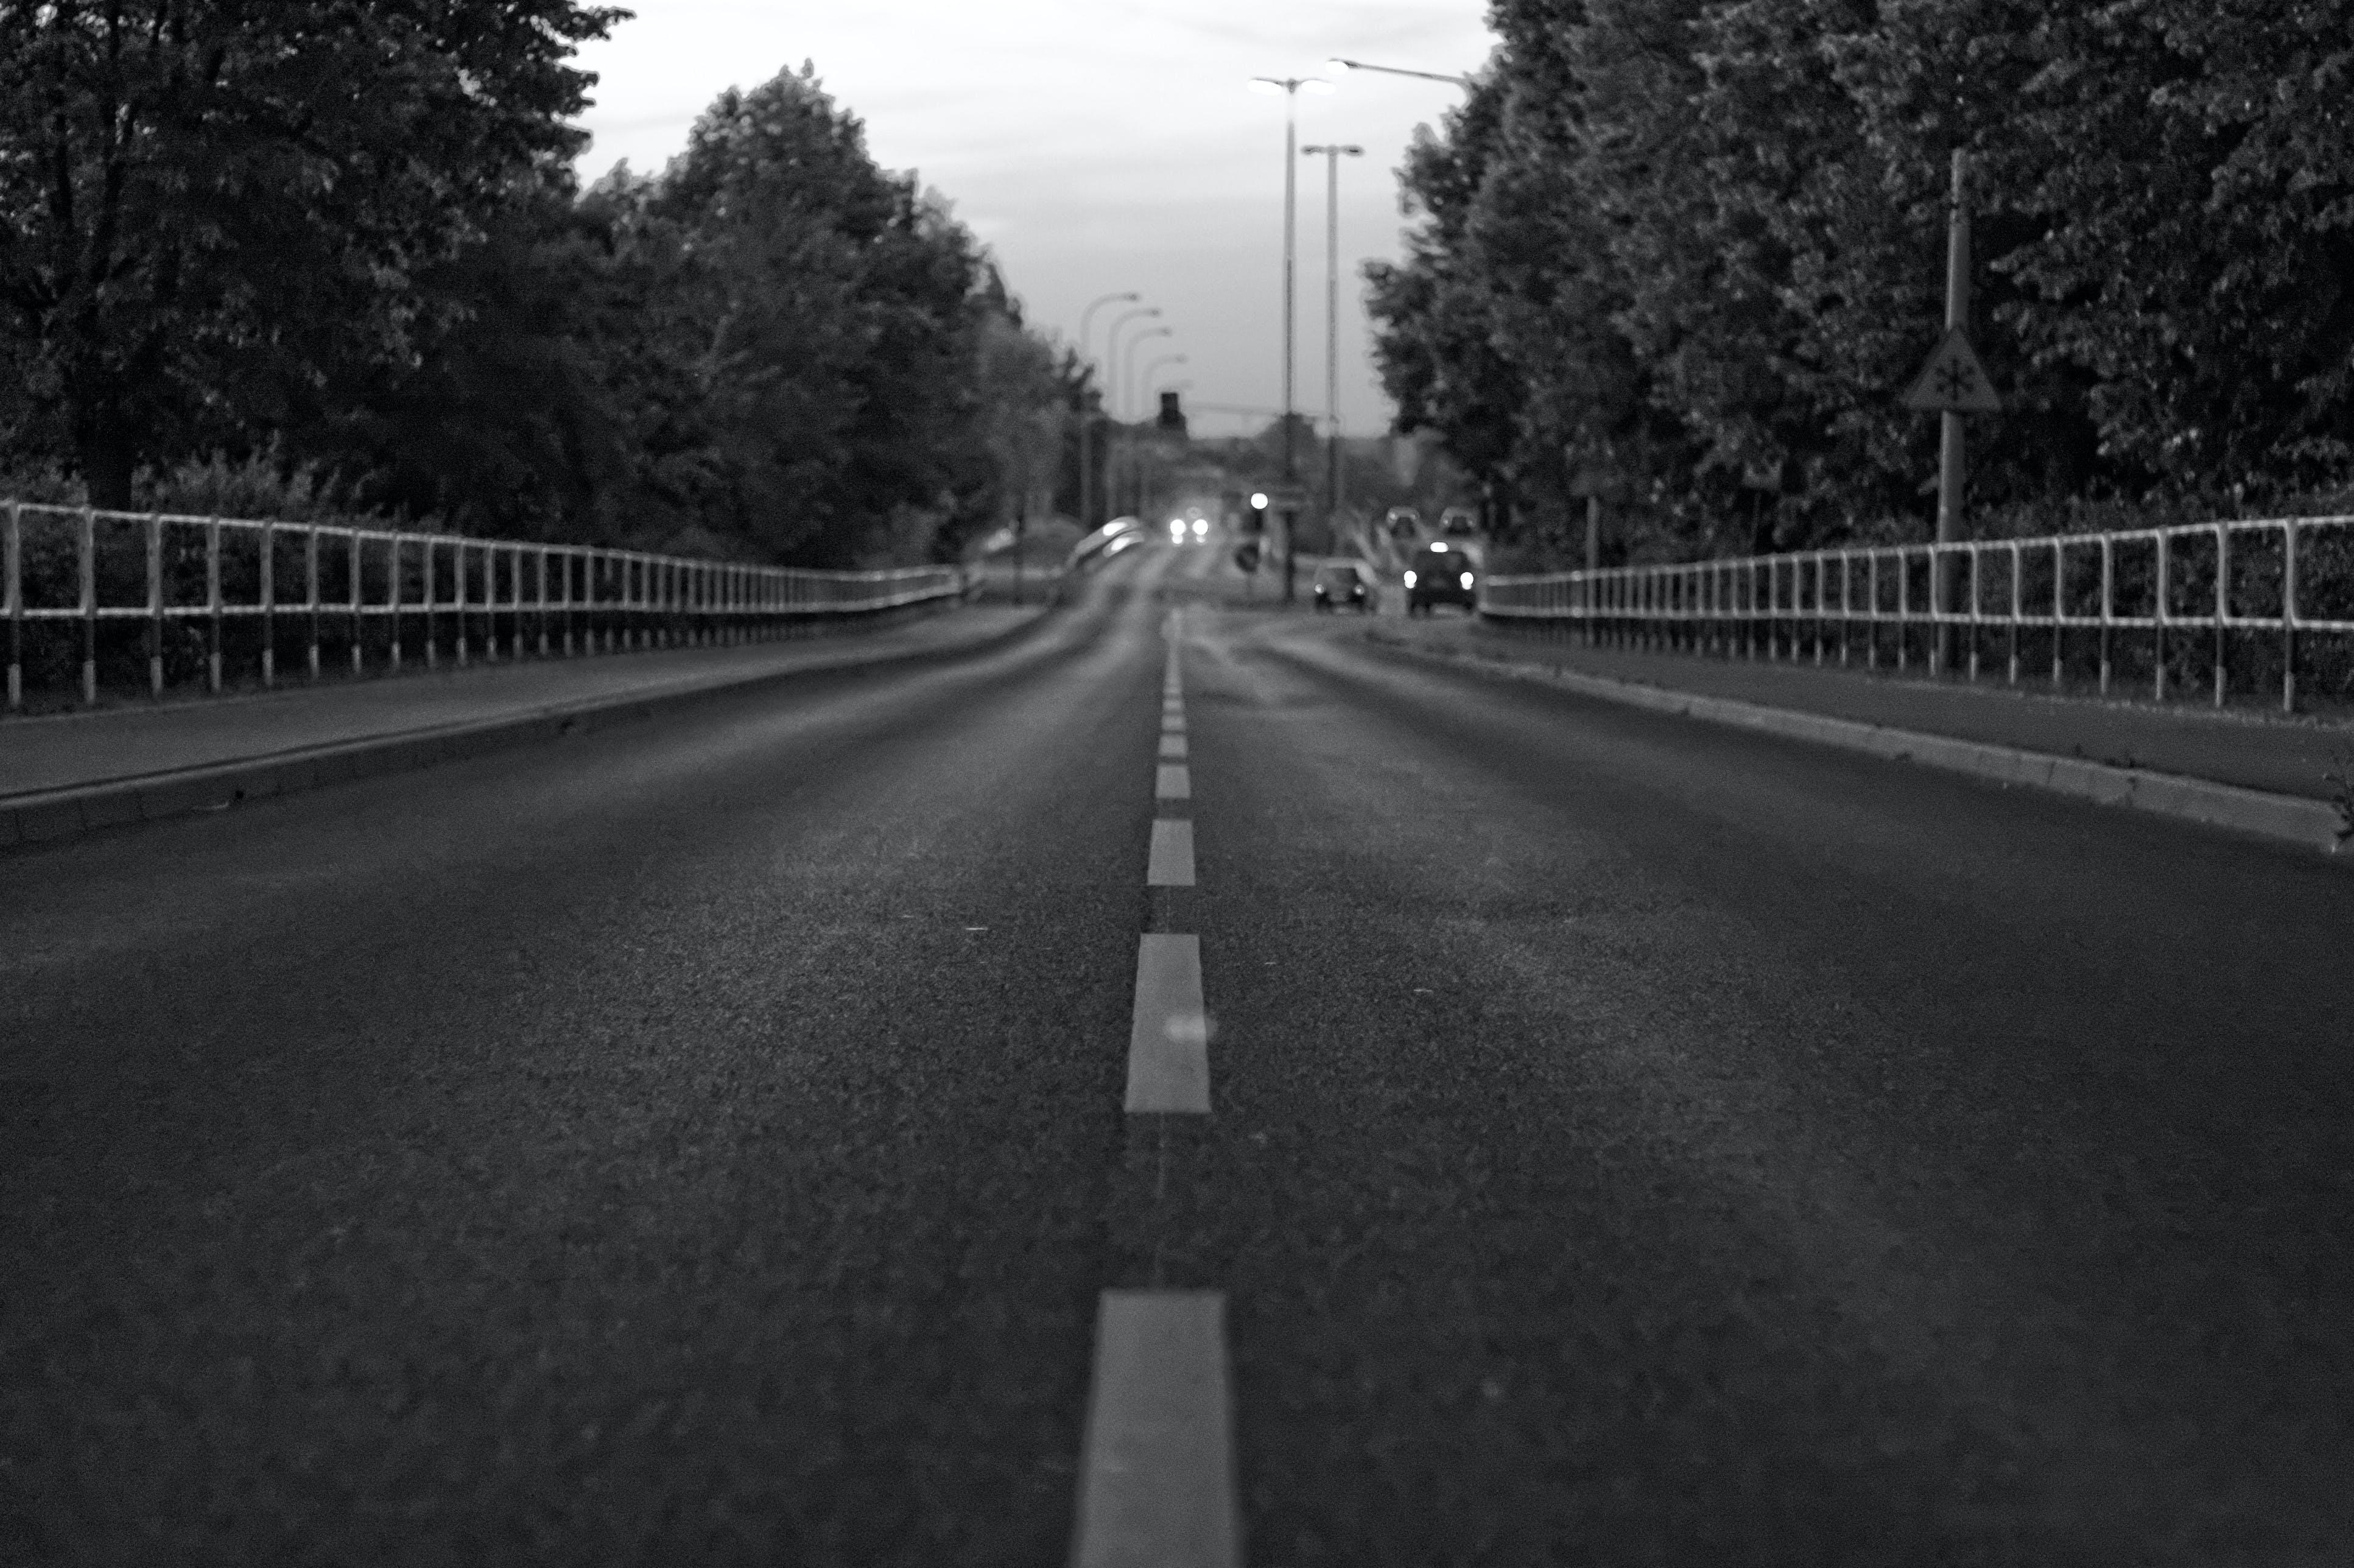 Free stock photo of city, road, street